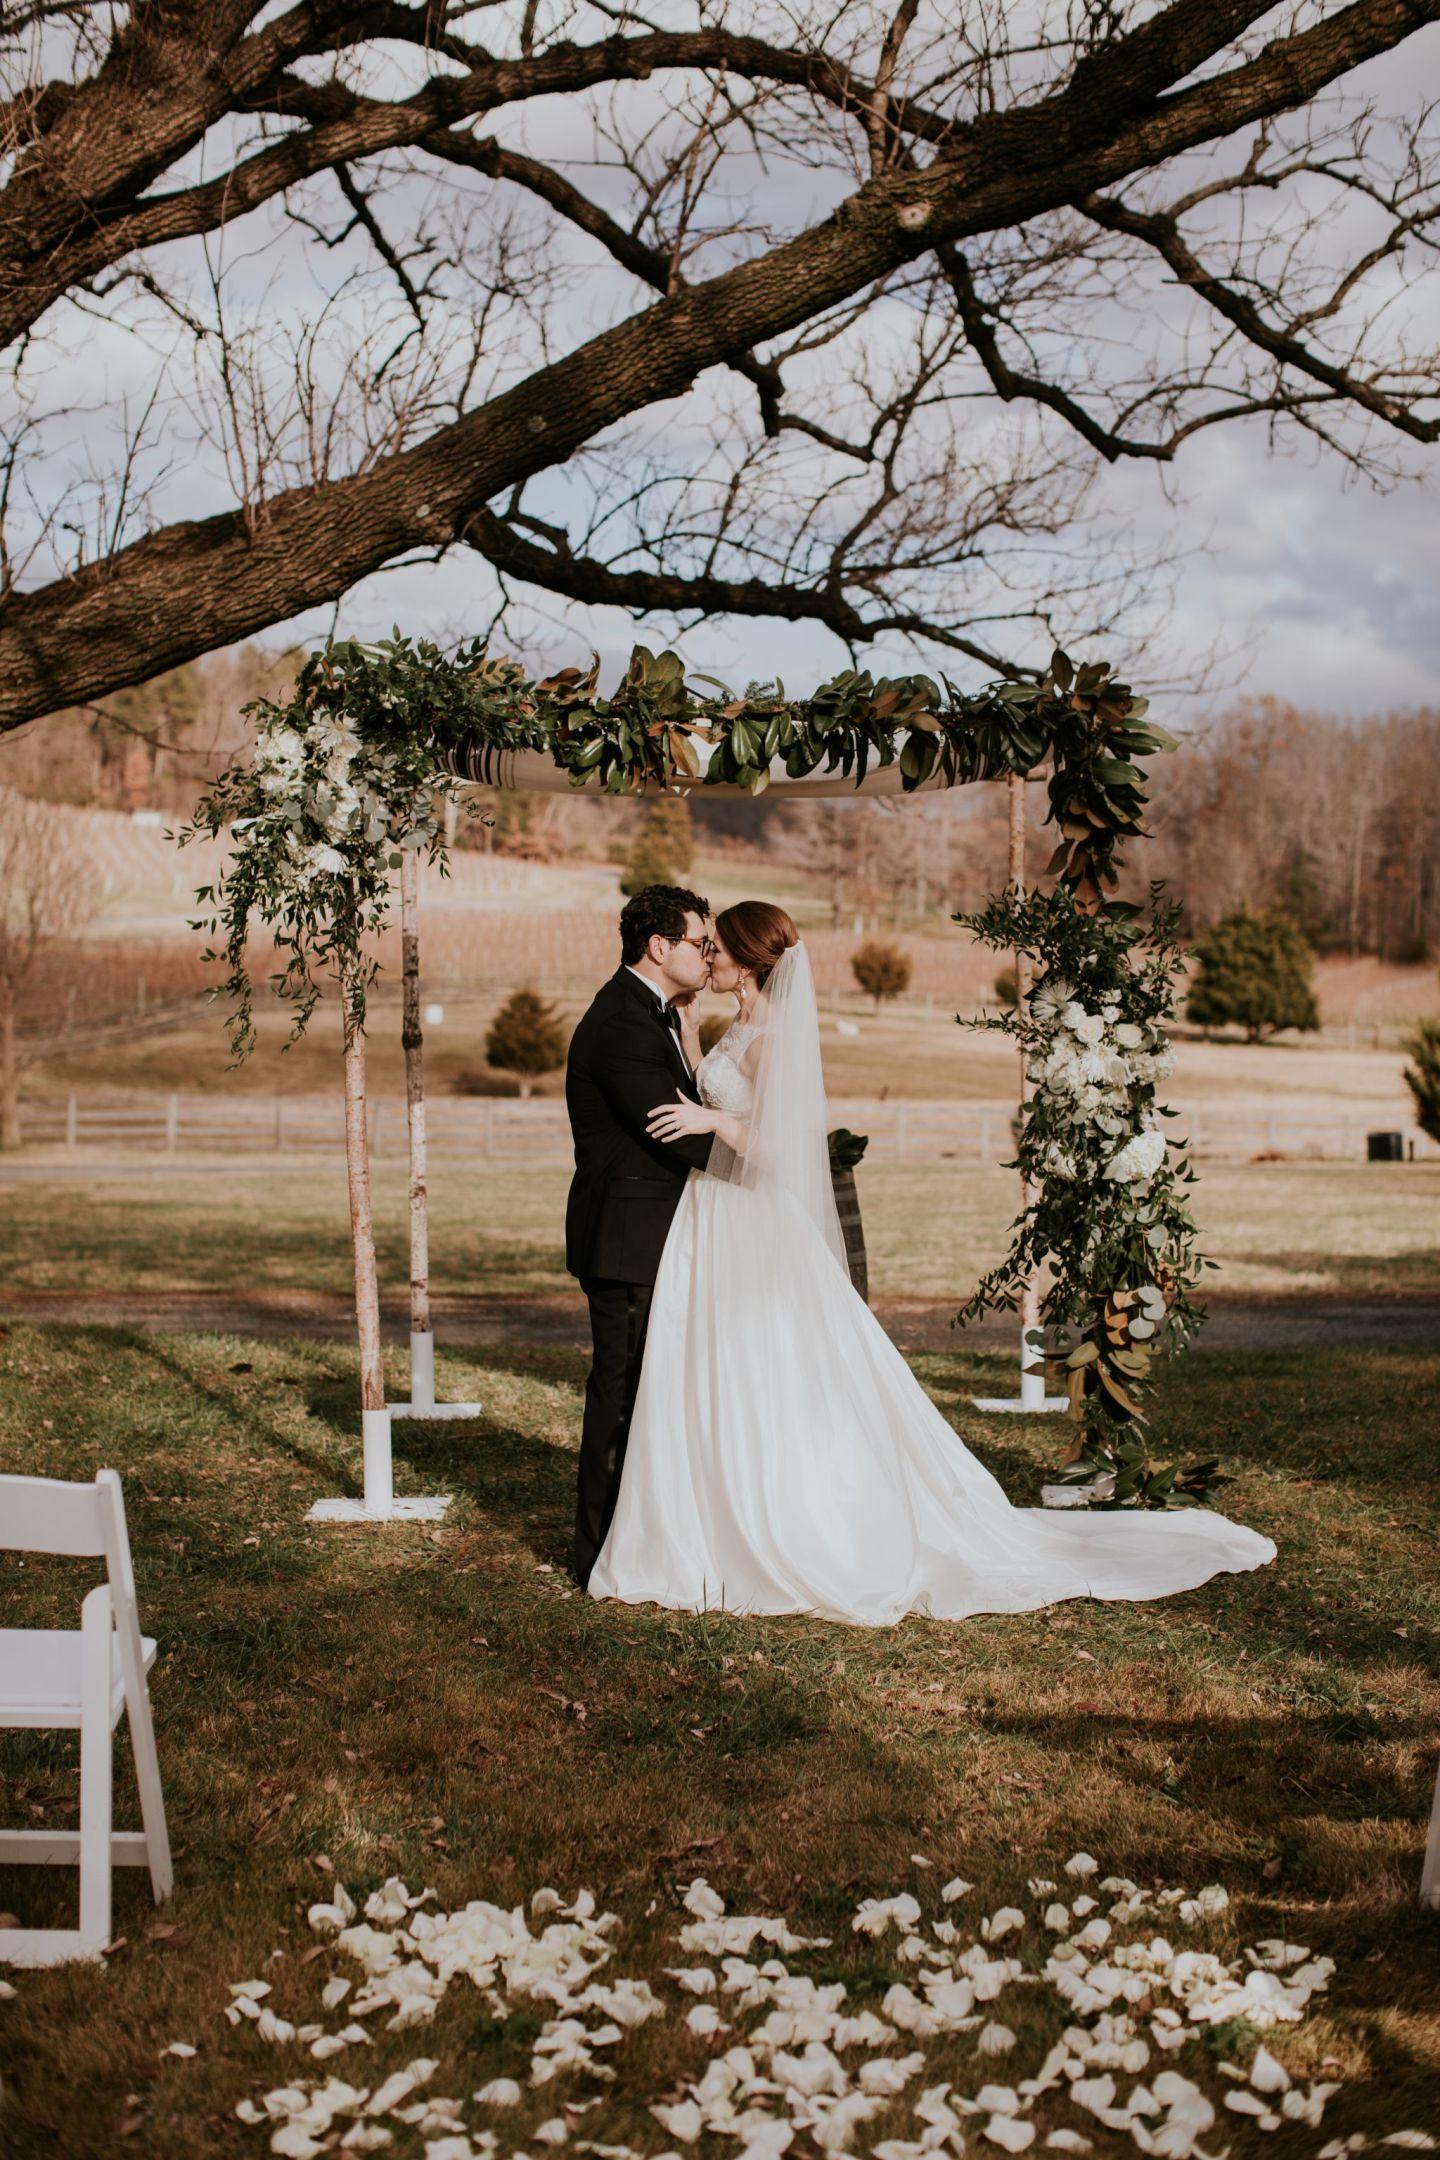 winter wedding flowers - winter chuppah - chuppah with magnolia